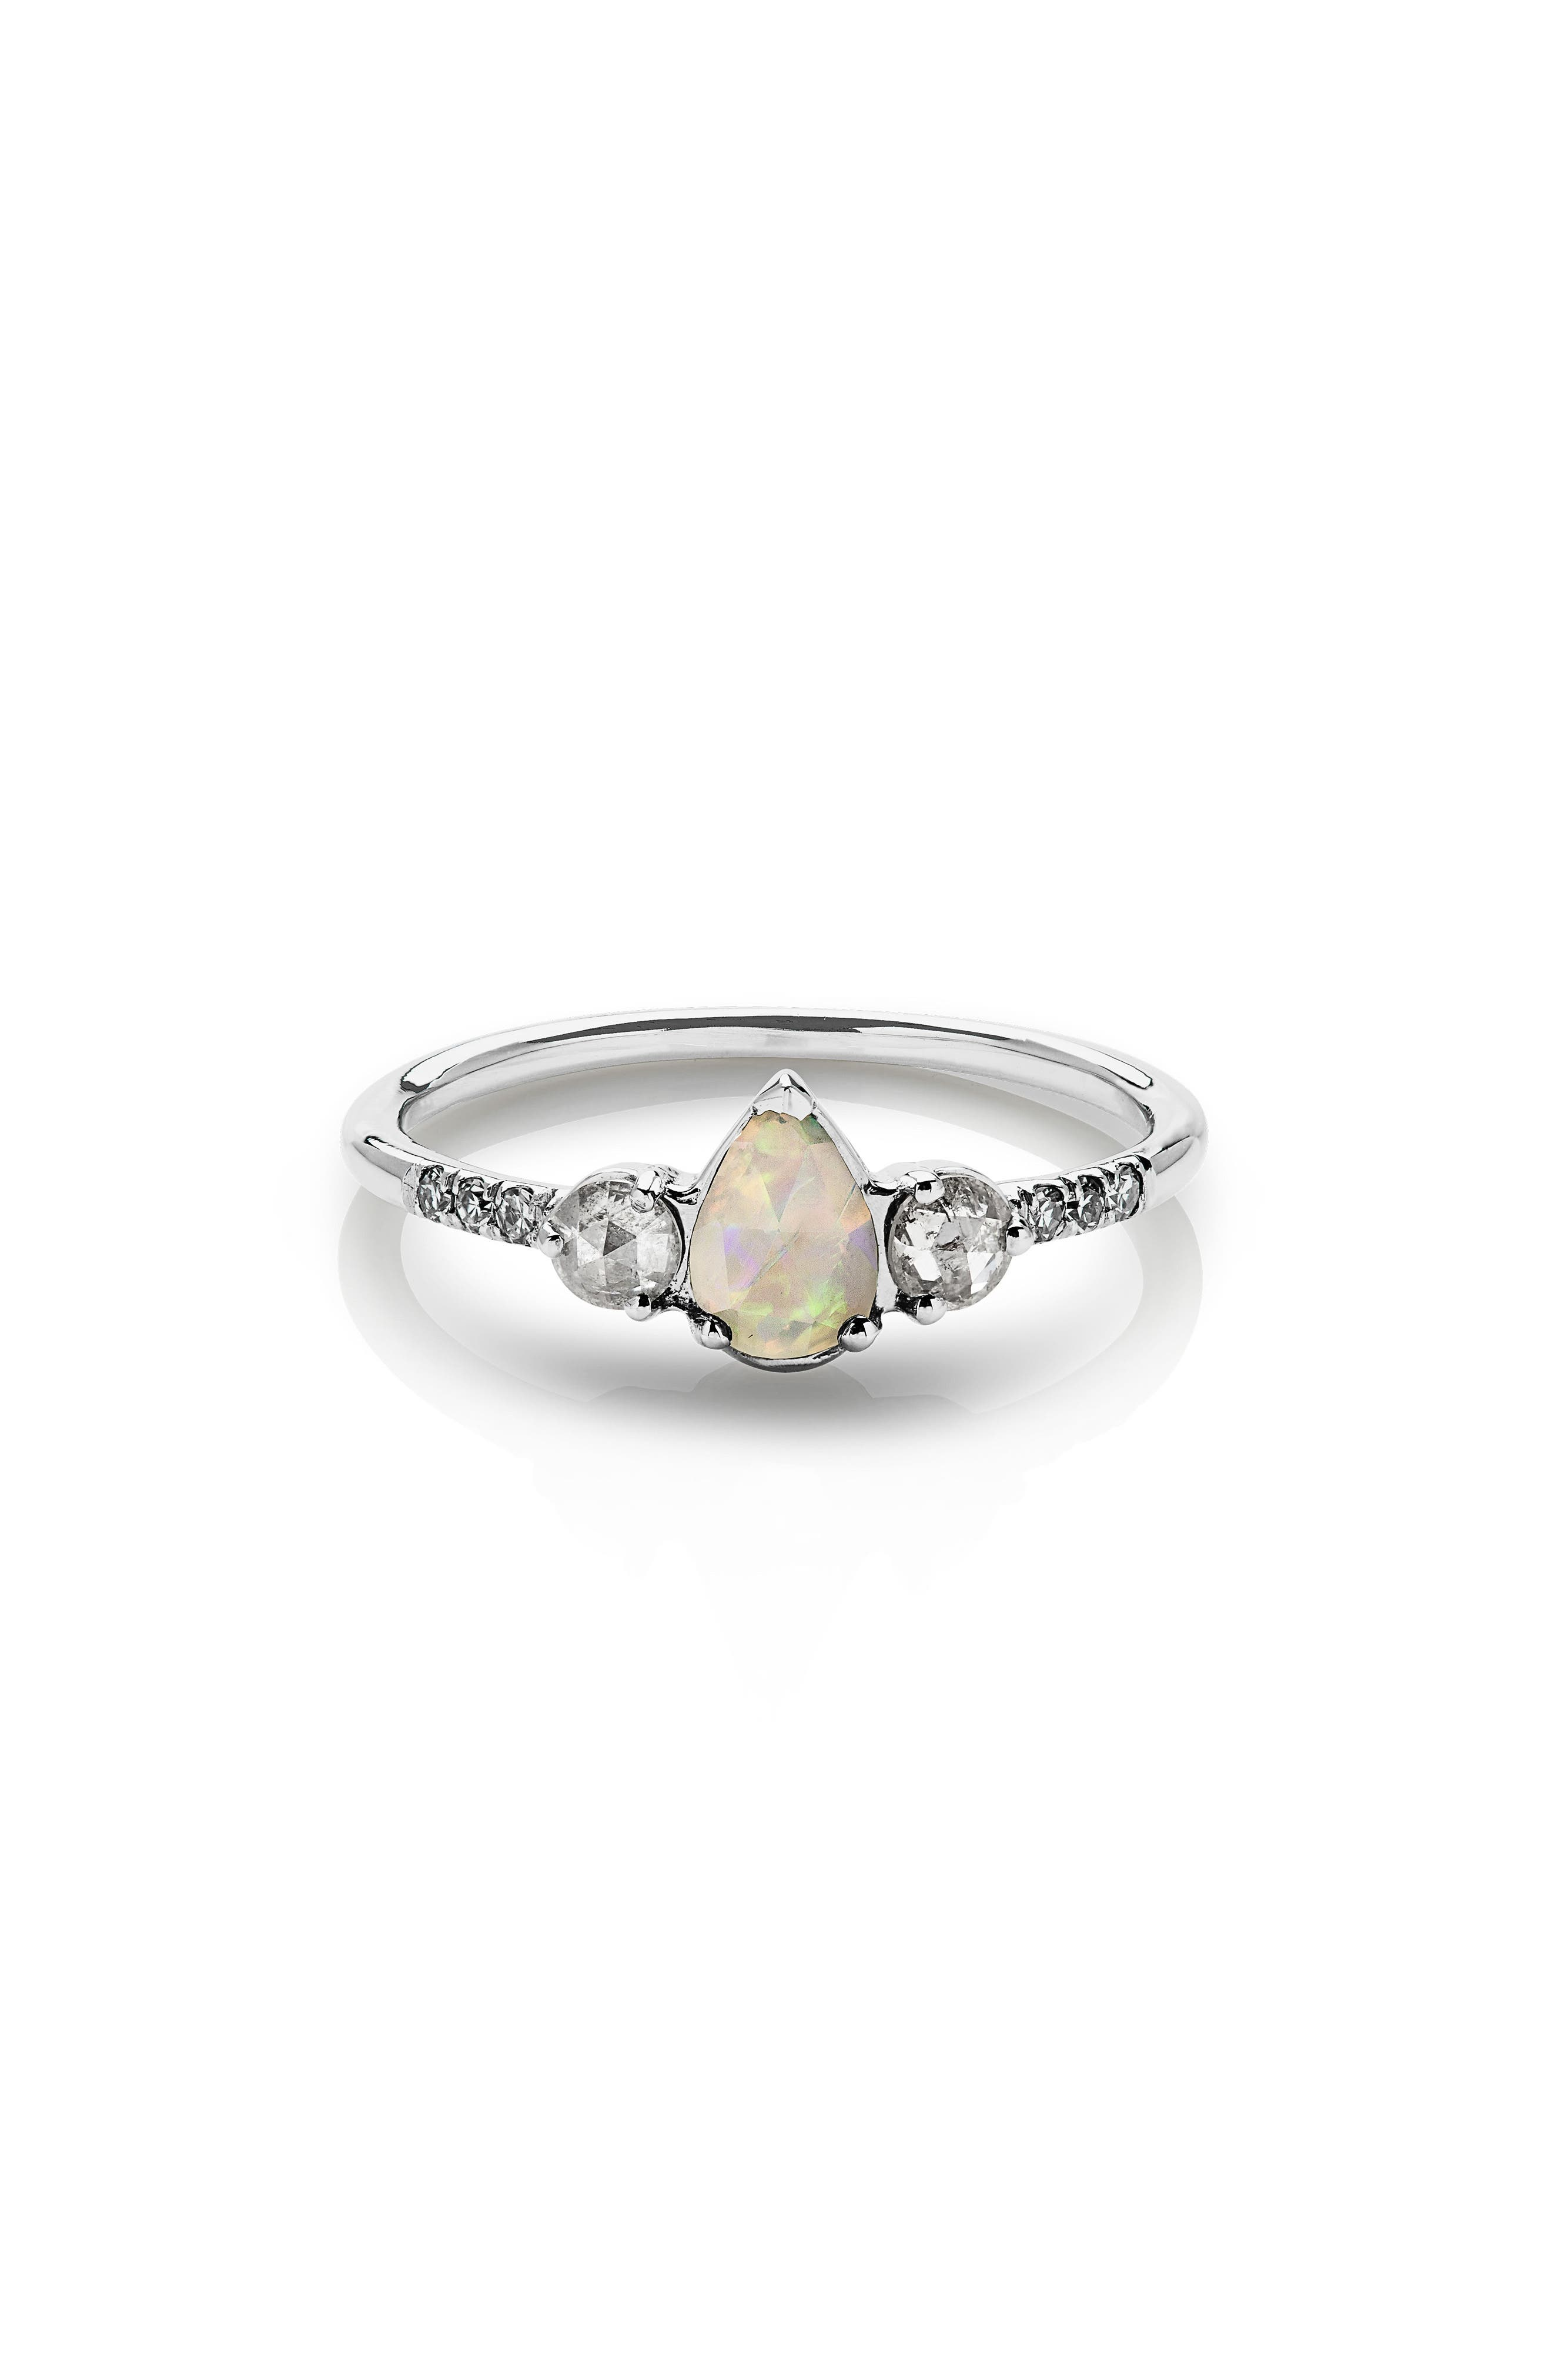 Radiance Opal & Diamond Ring,                             Main thumbnail 1, color,                             White Gold